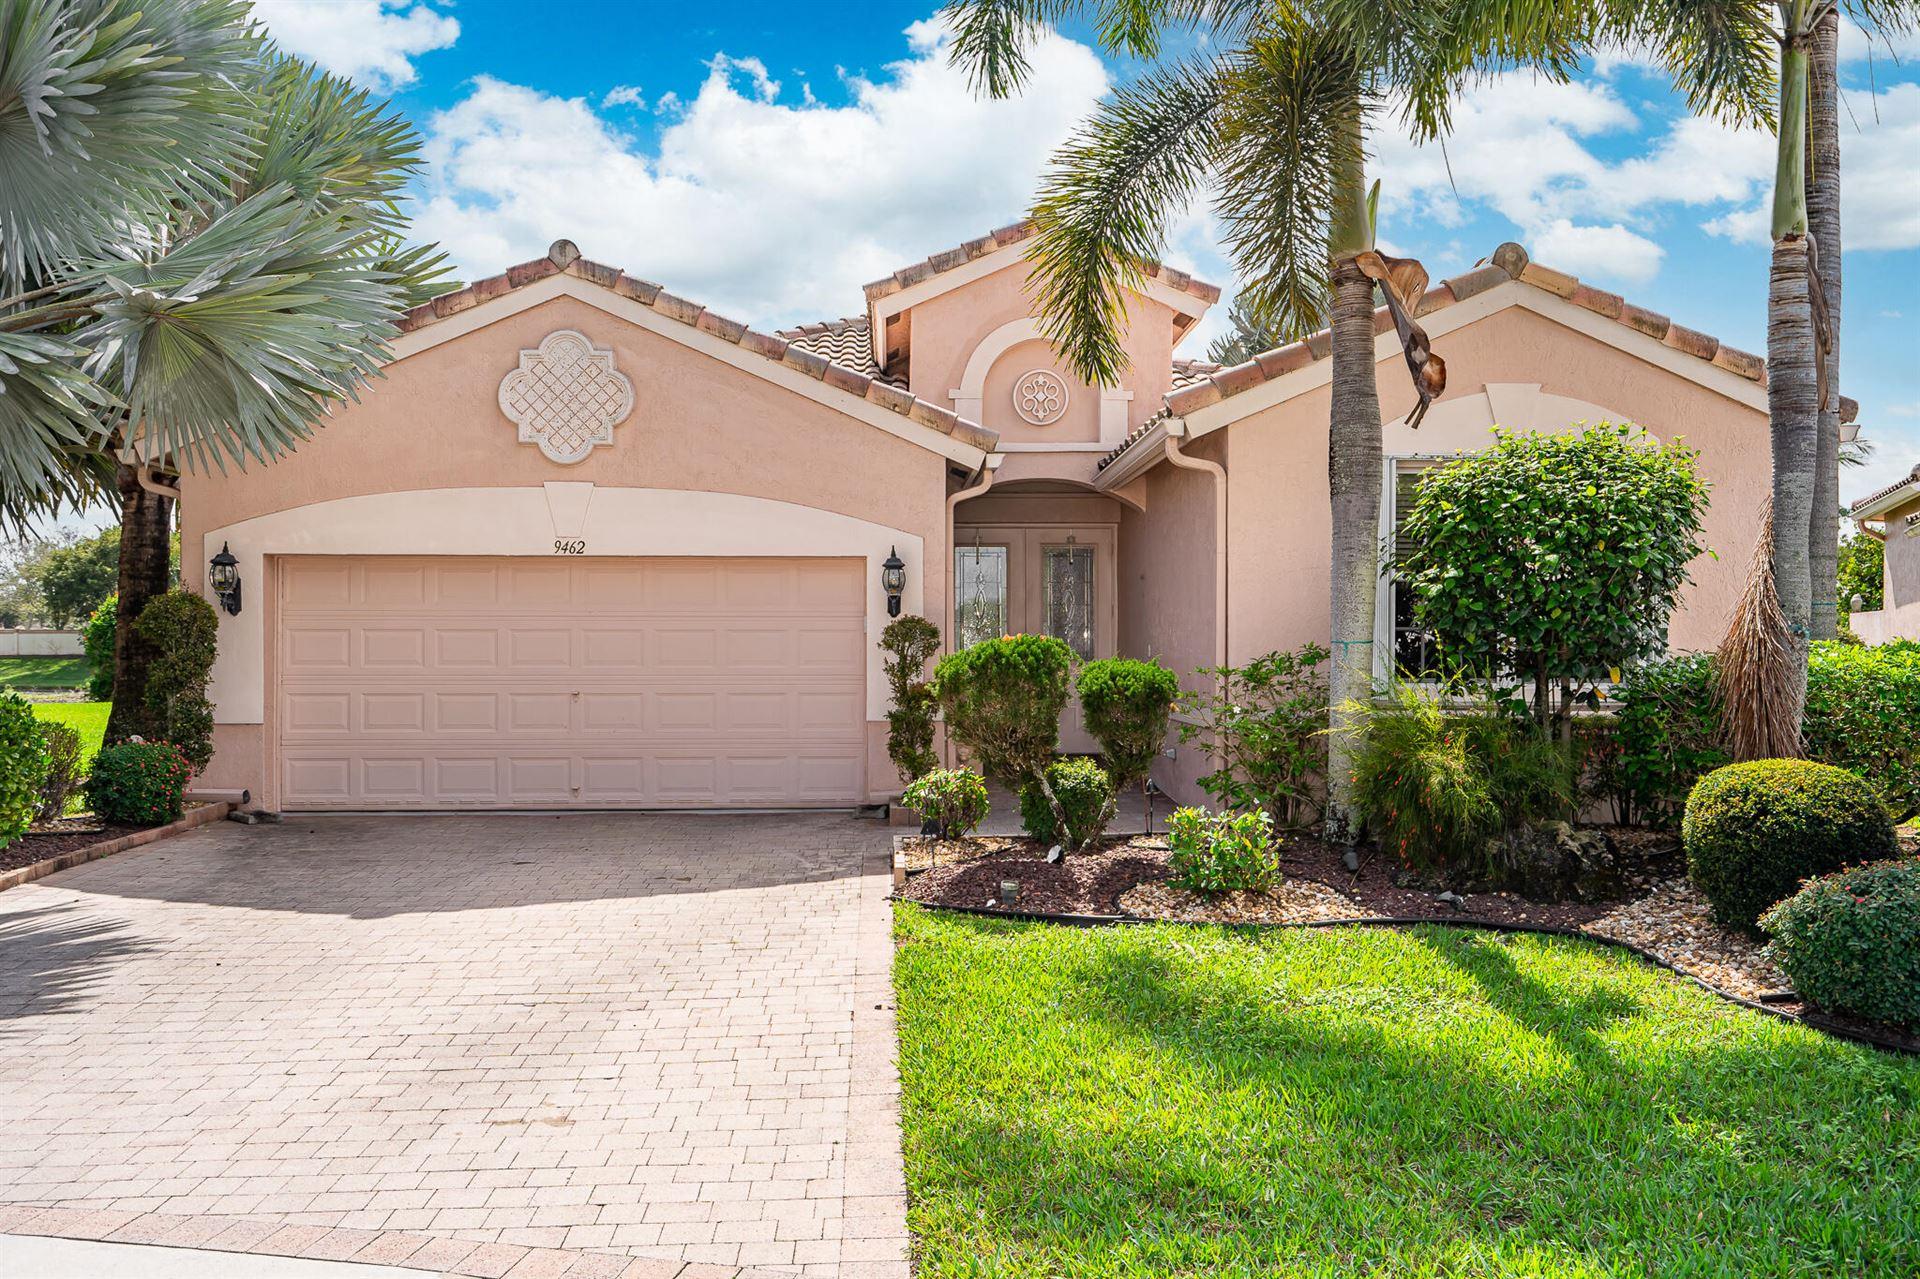 9462 Vercelli Street, Lake Worth, FL 33467 - #: RX-10682892